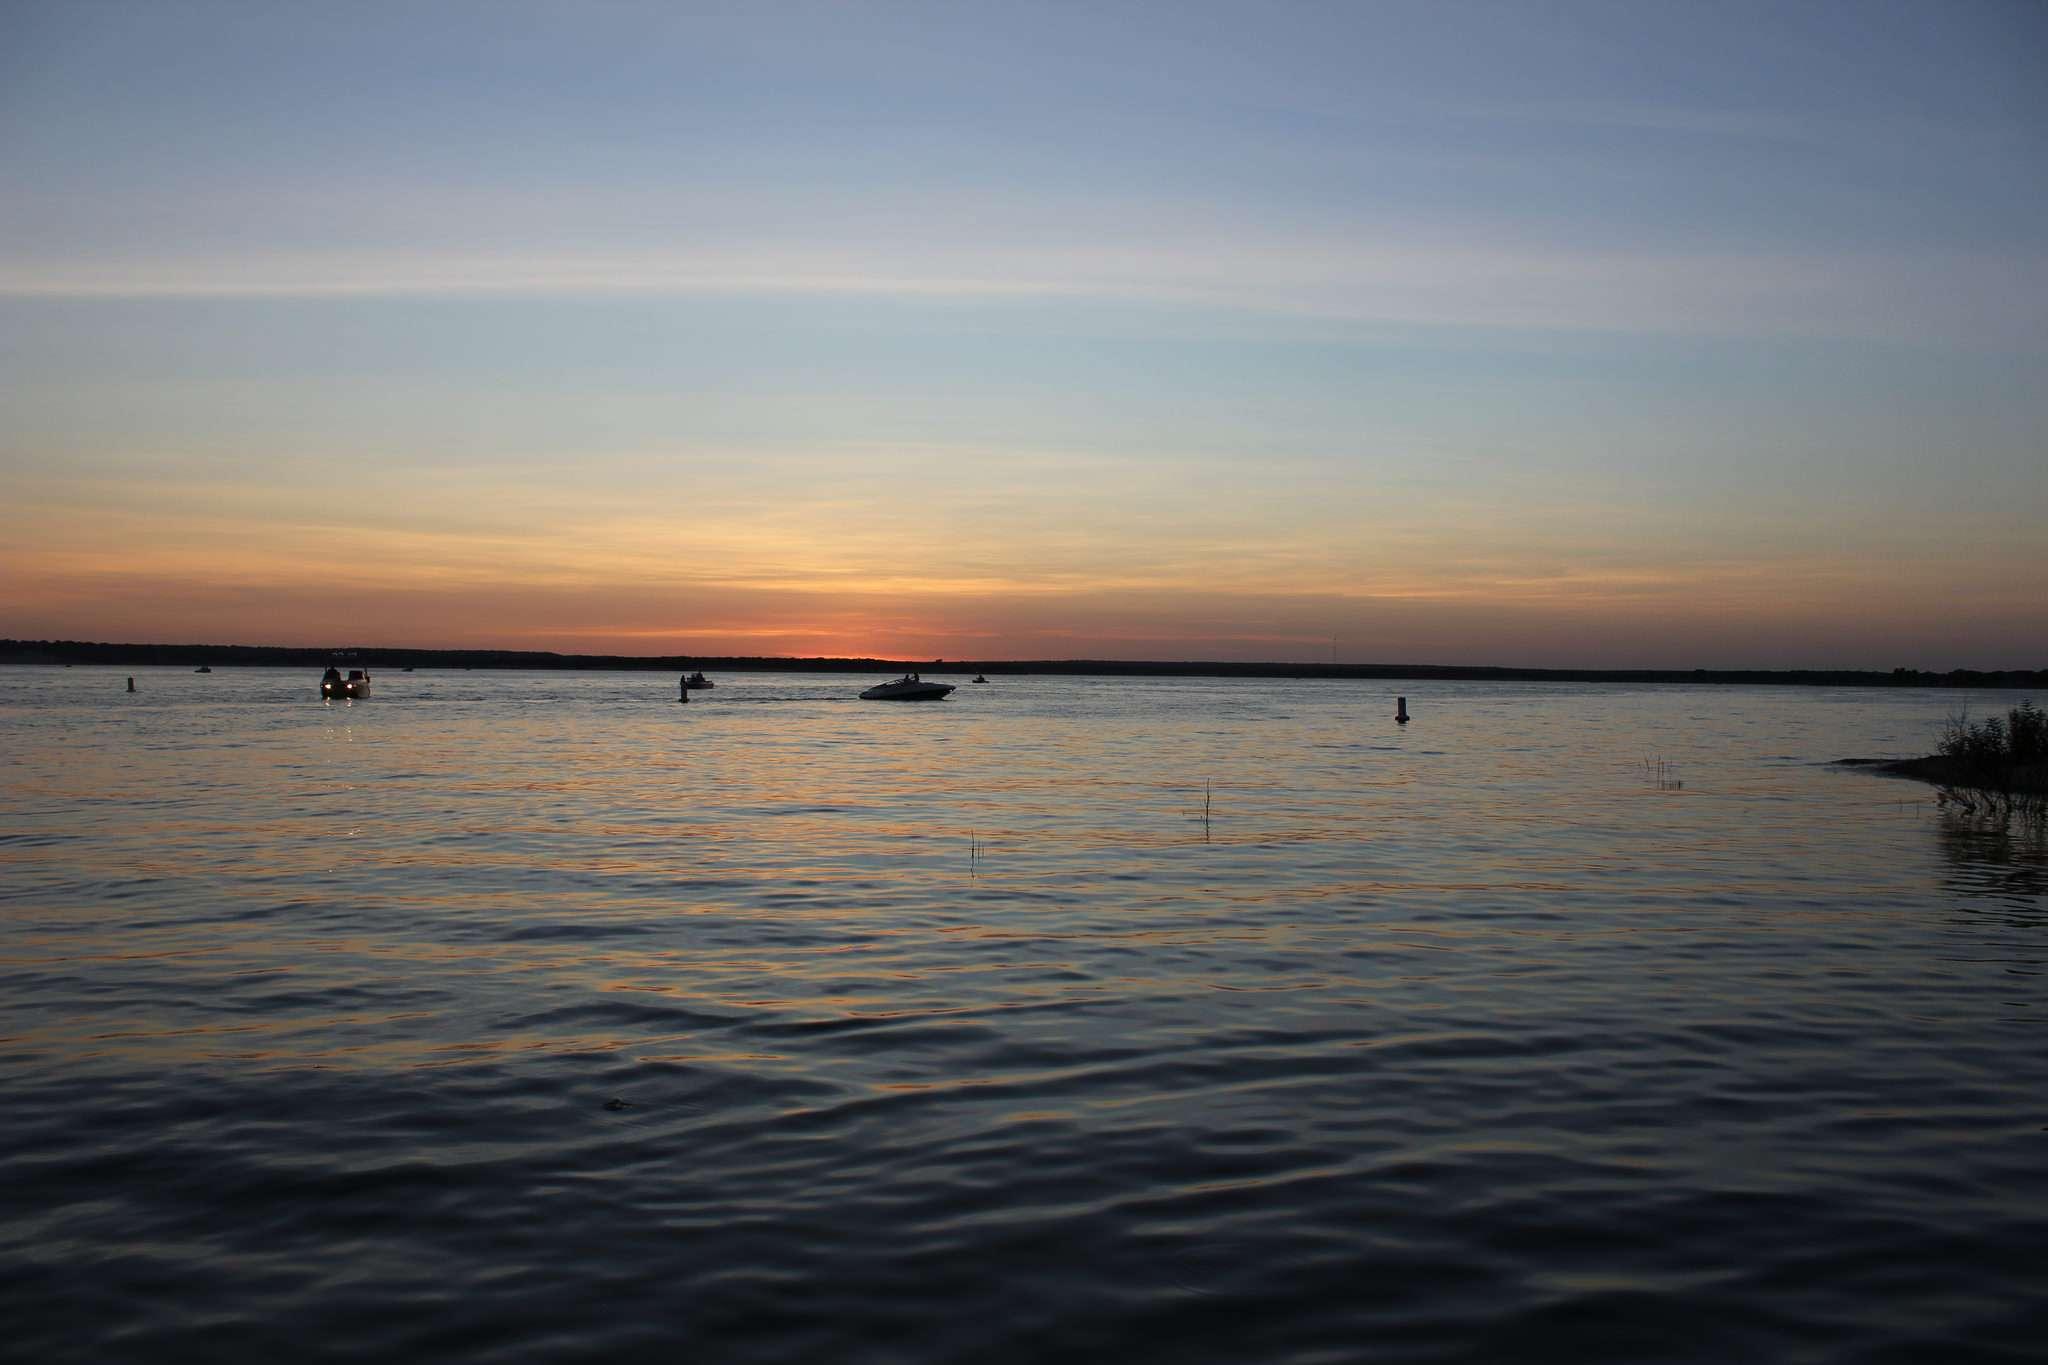 Anochecer del lago Whitney